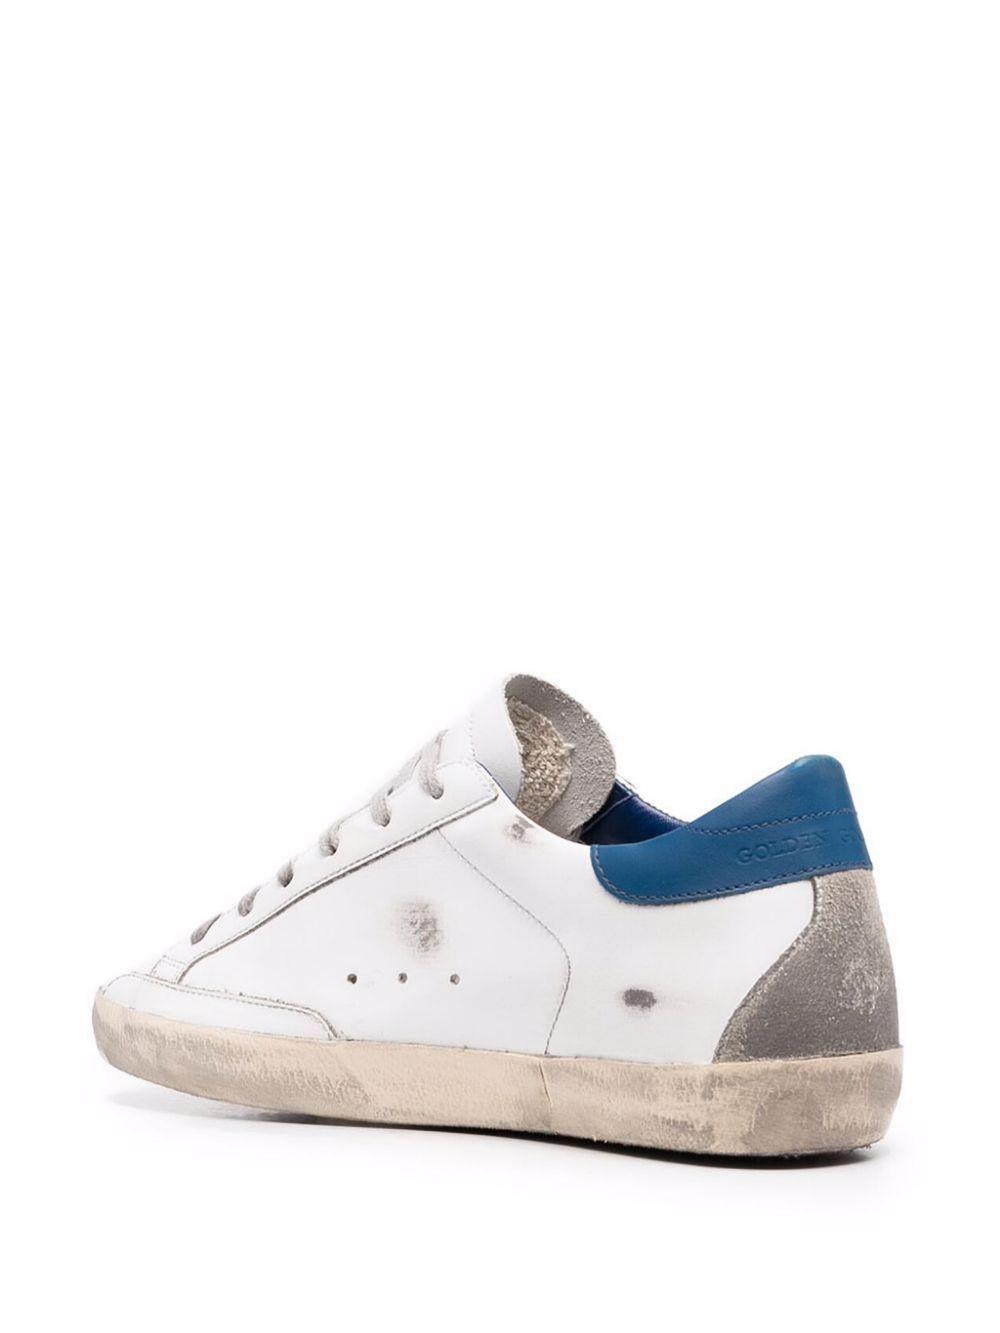 Picture of Golden Goose Deluxe Brand   Superstar Distressed Sneakers